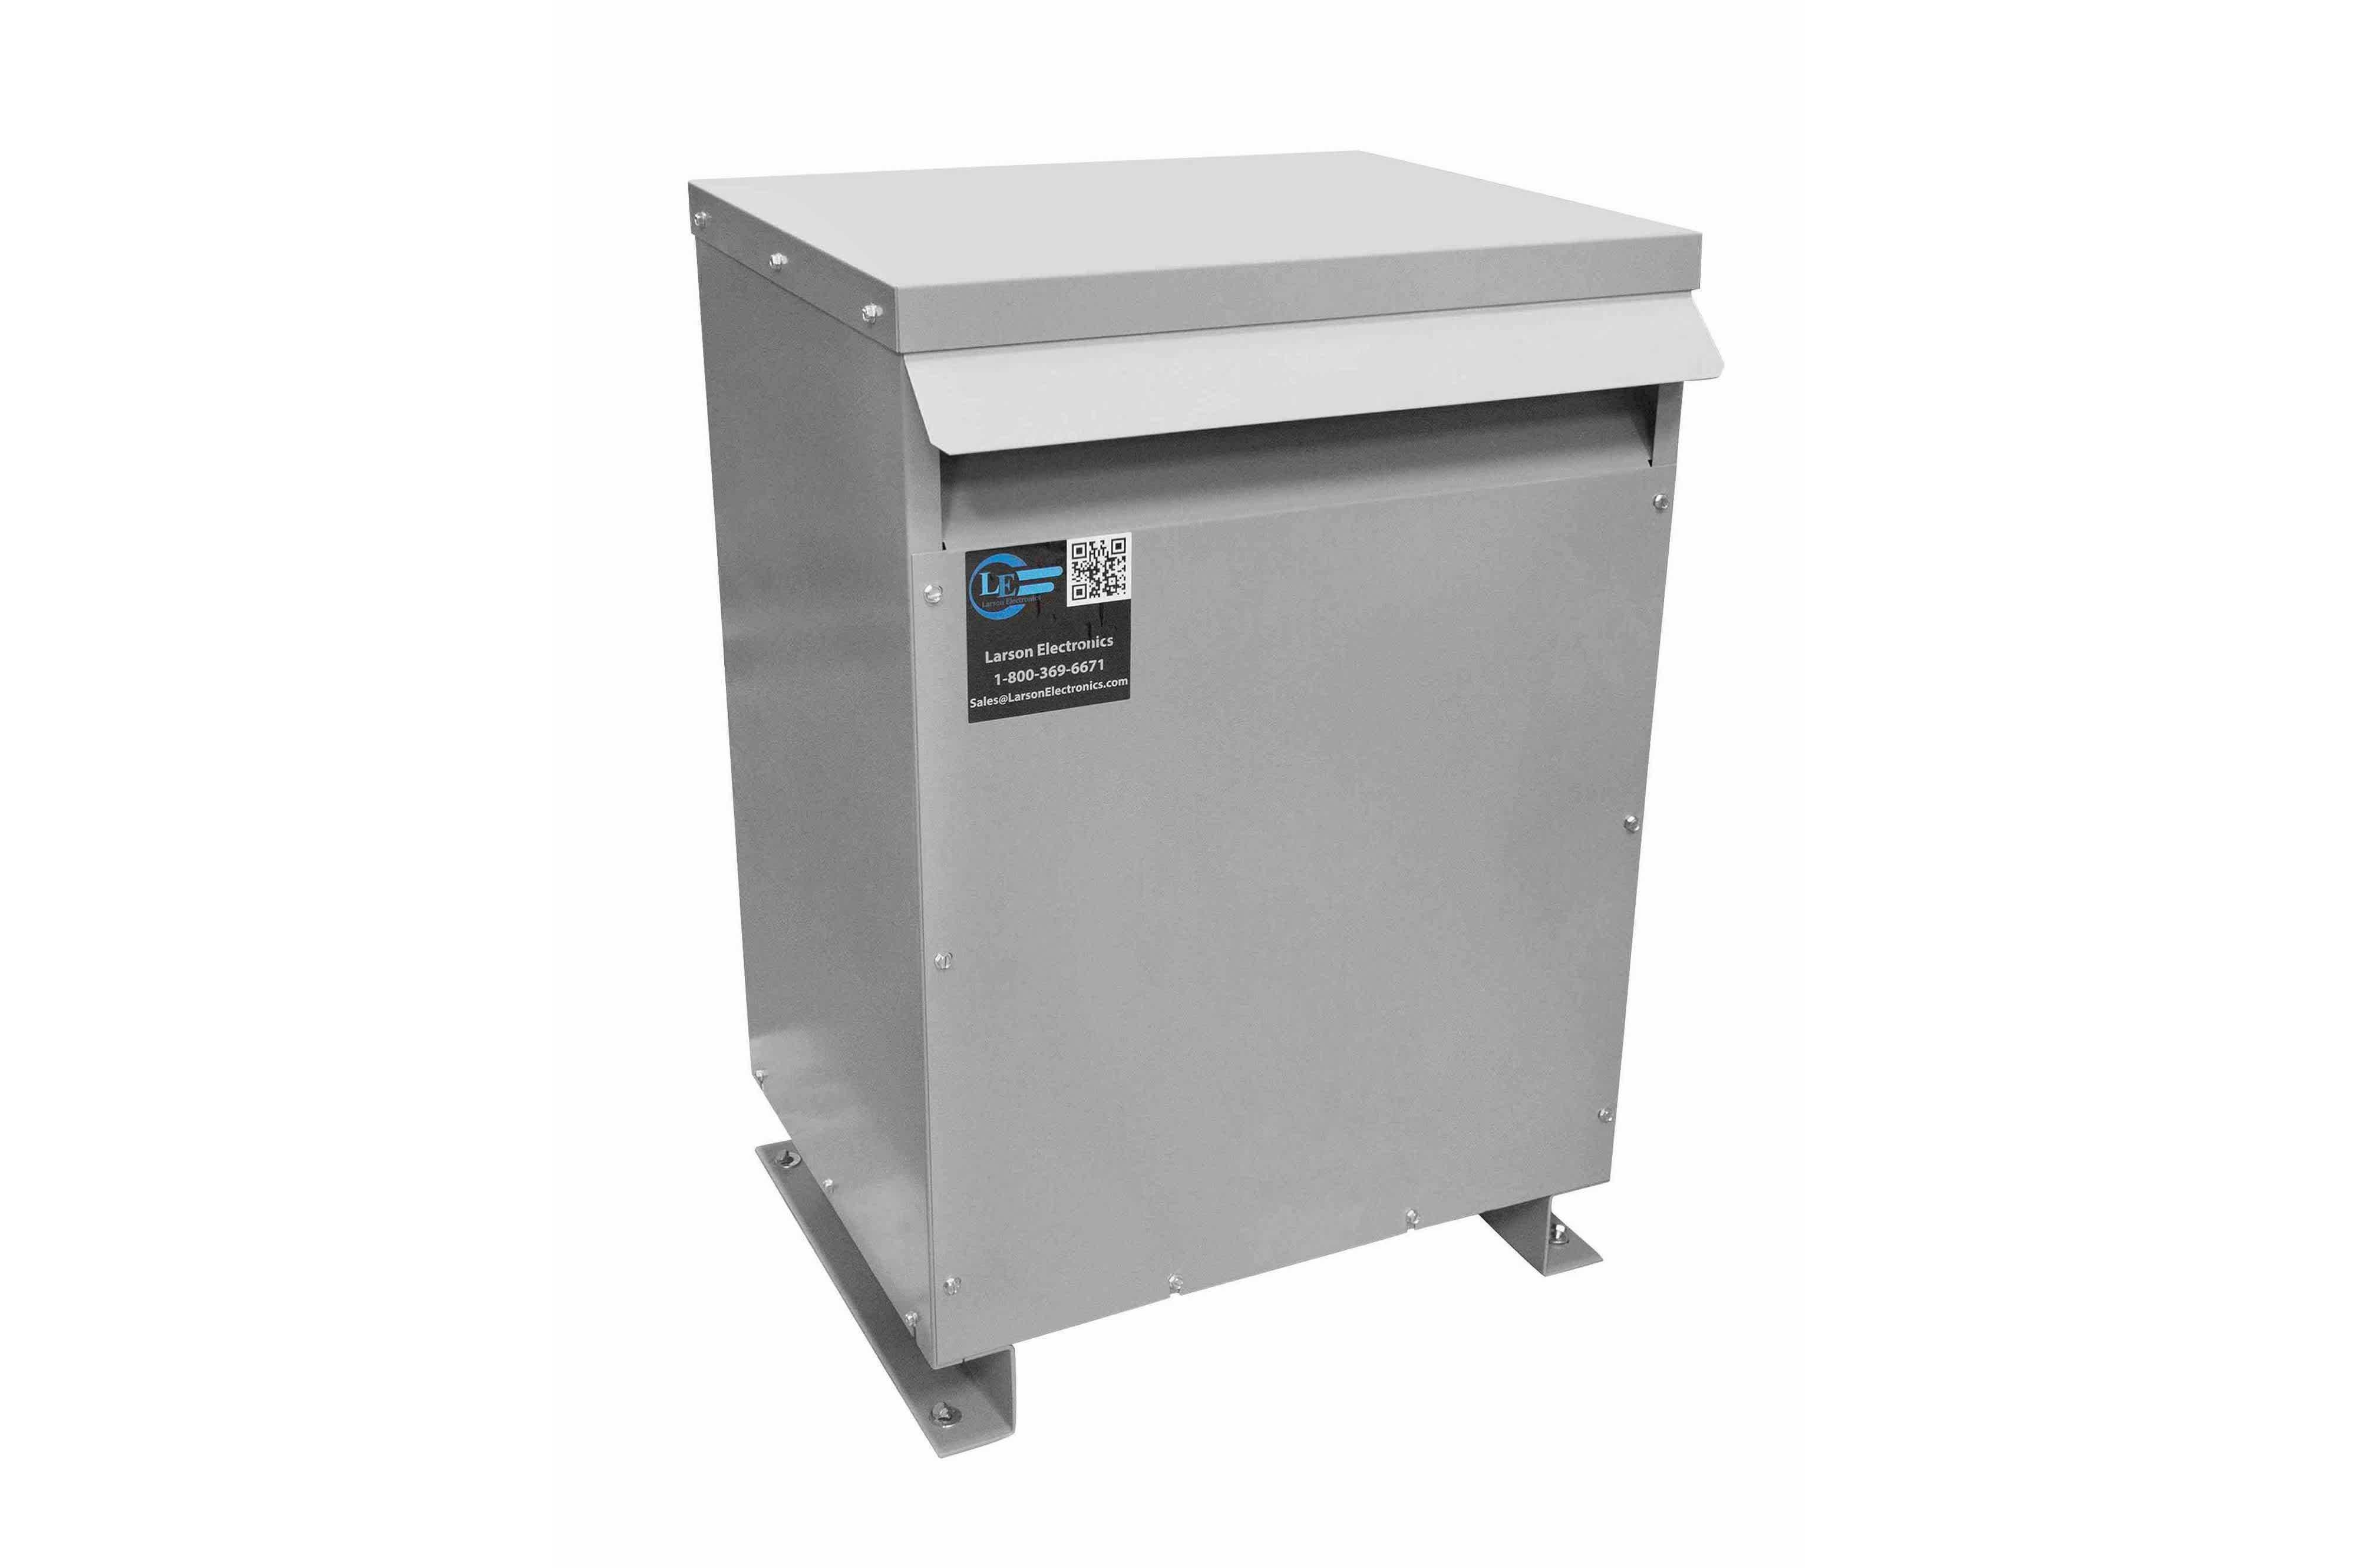 110 kVA 3PH Isolation Transformer, 440V Wye Primary, 240V/120 Delta Secondary, N3R, Ventilated, 60 Hz